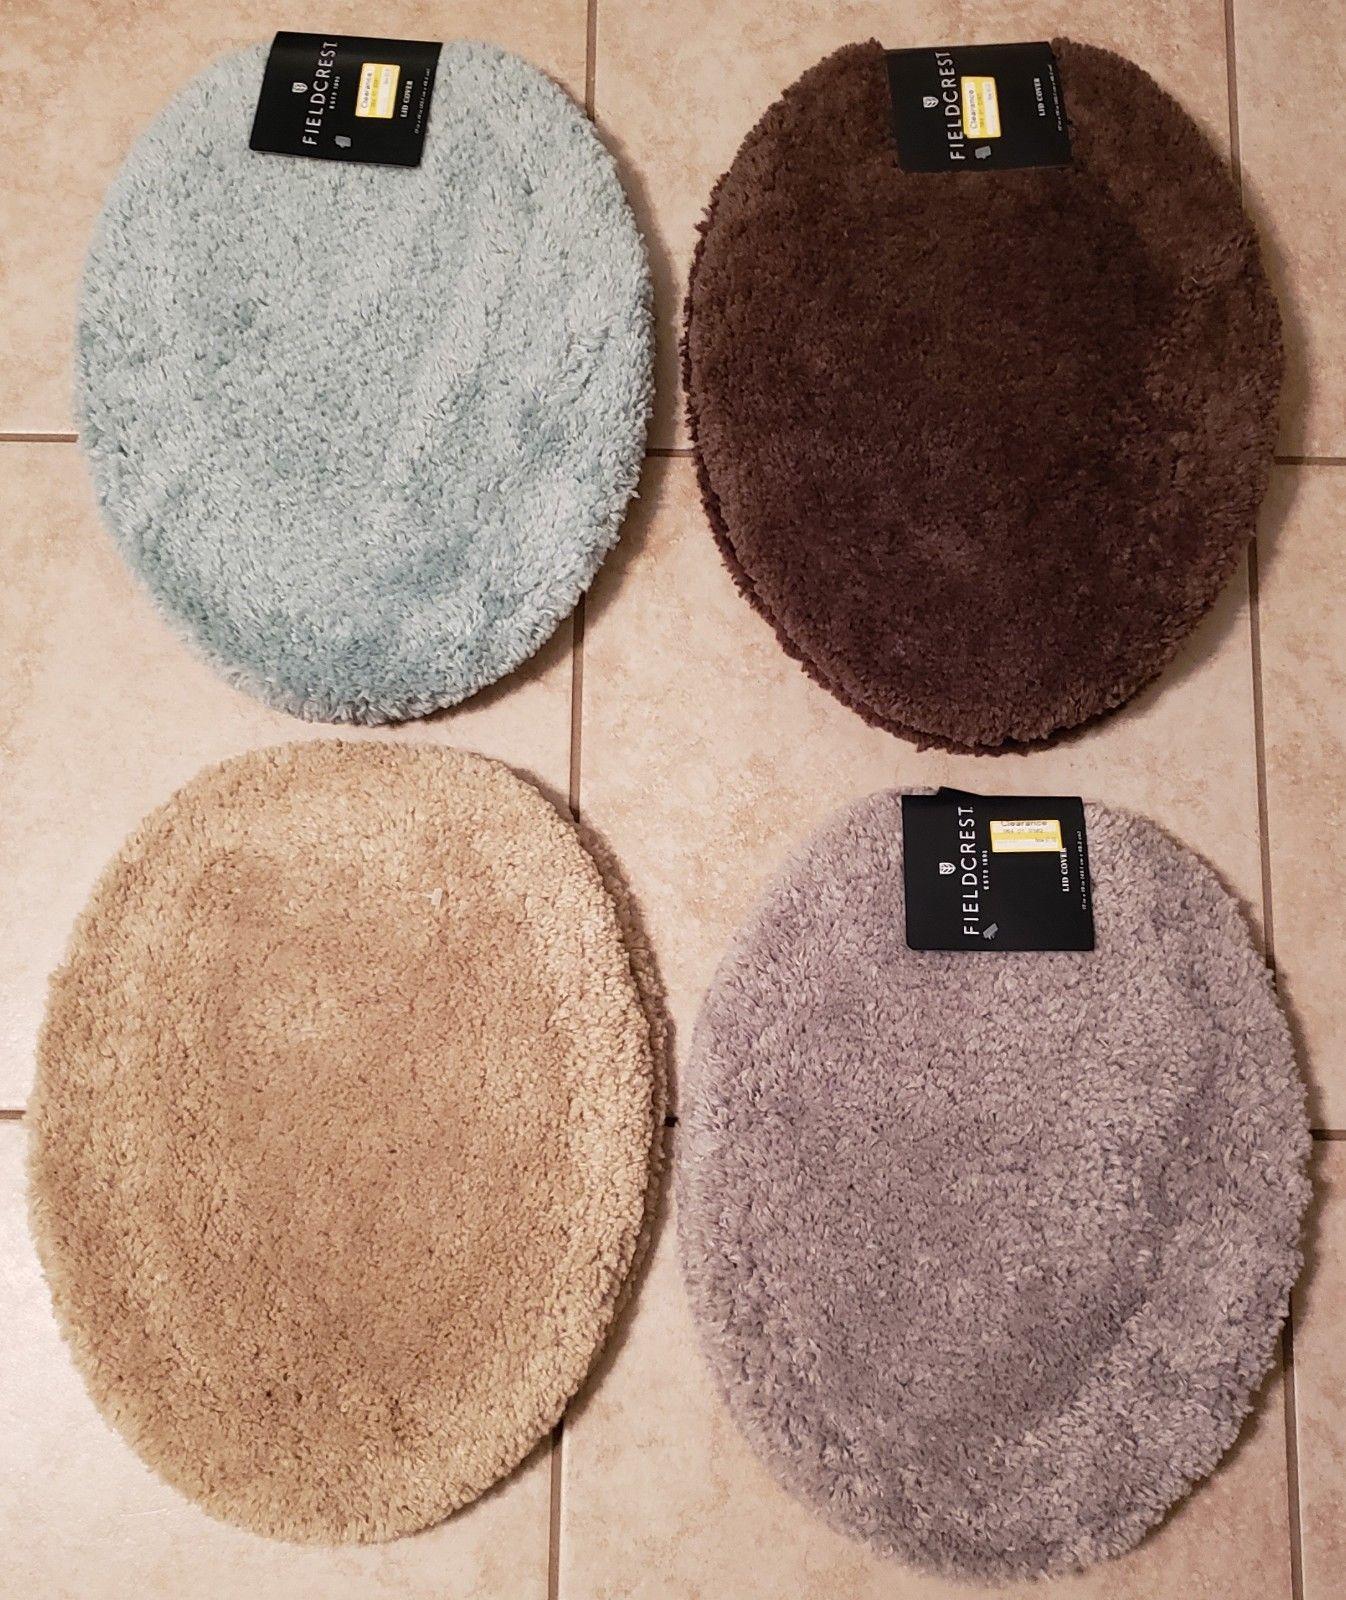 Bathmats Rugs And Toilet Covers 133696 Fieldcrest Soft Luxury Bath